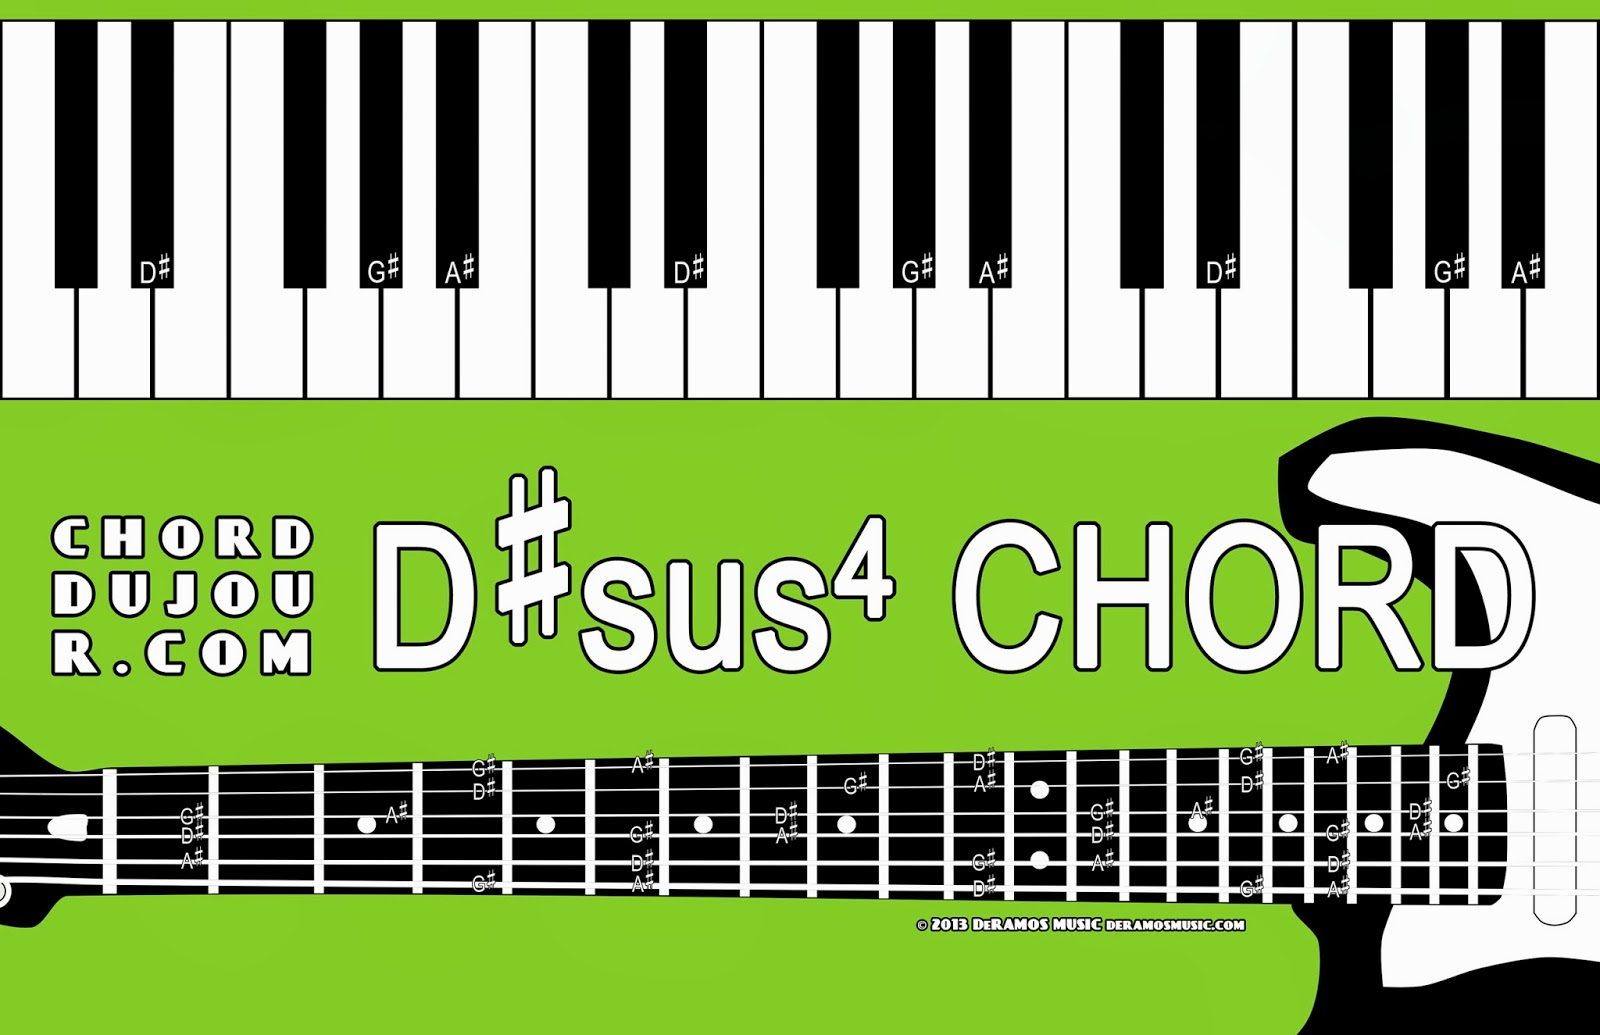 Chord du jour dictionary dsus4 chord dictionary dsus4 chord hexwebz Gallery